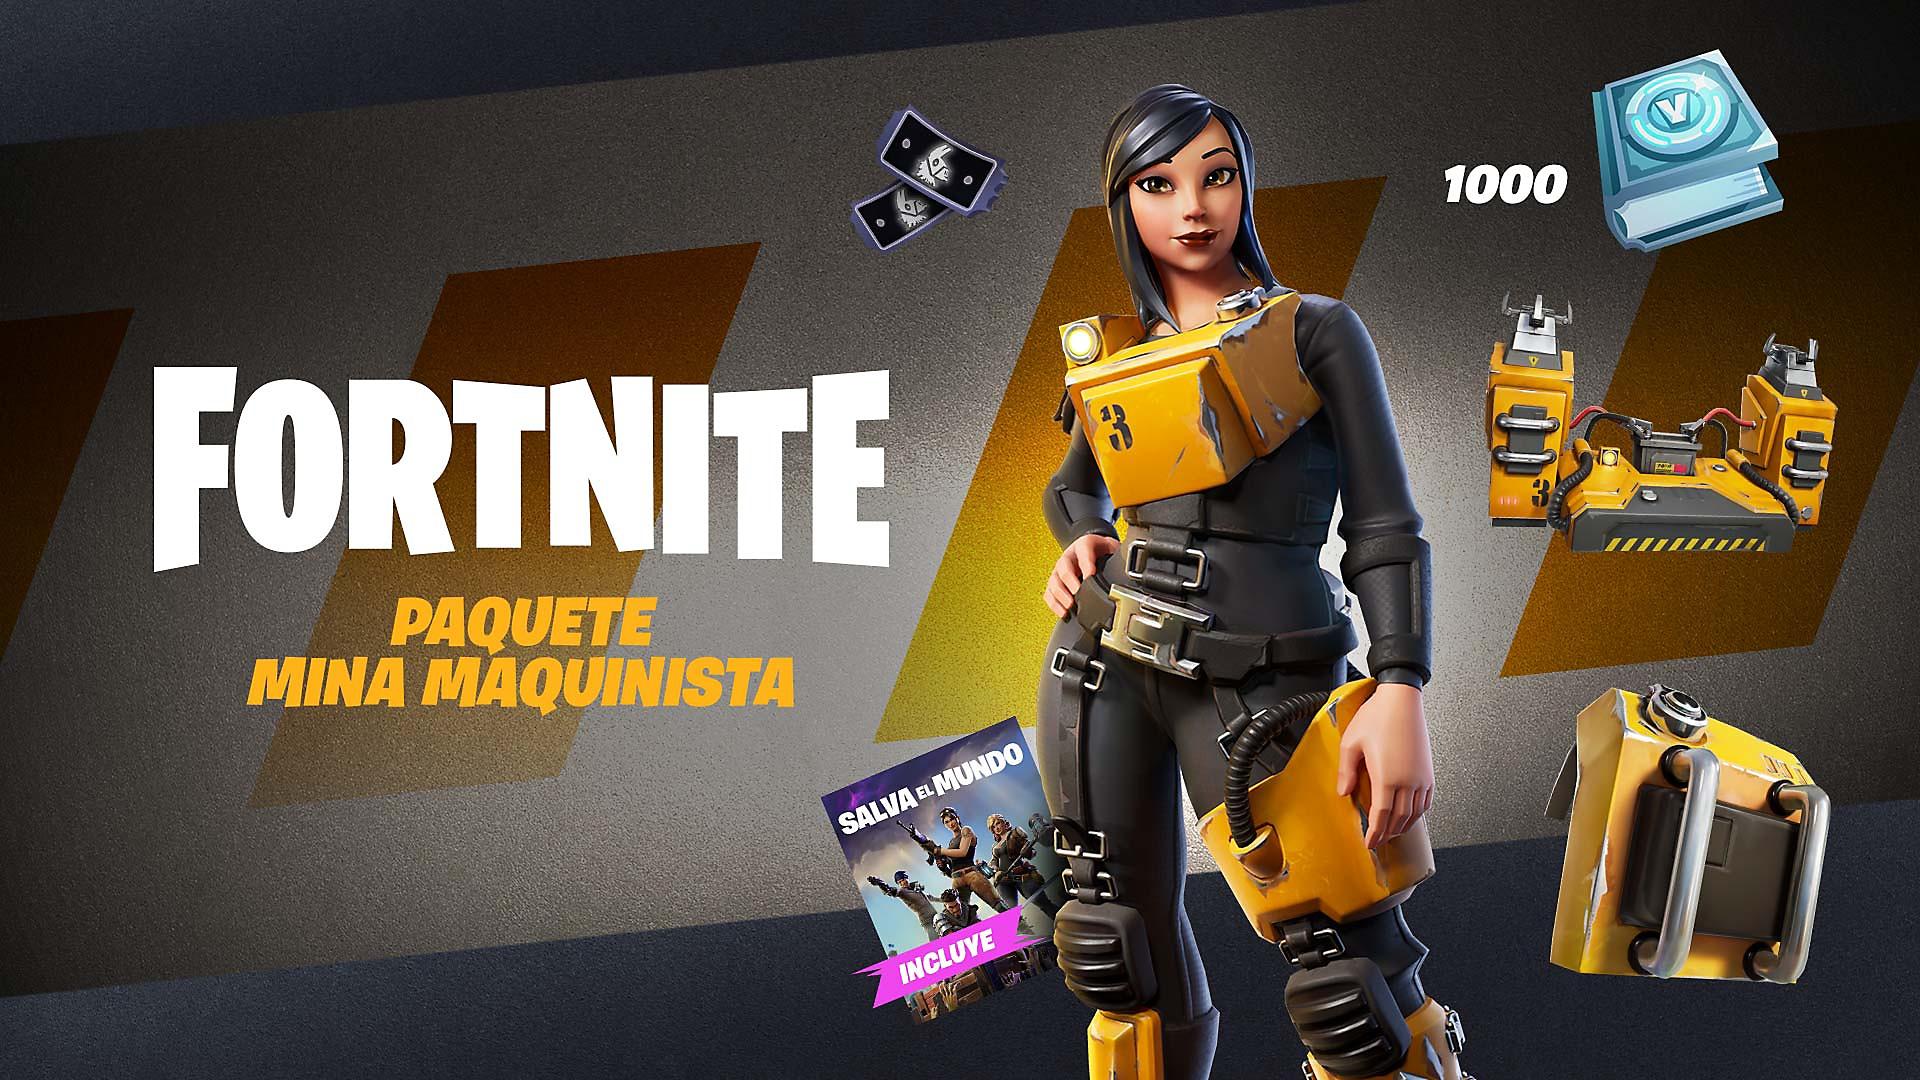 Fortnite - Pack fuerza motriz - Arte de tienda